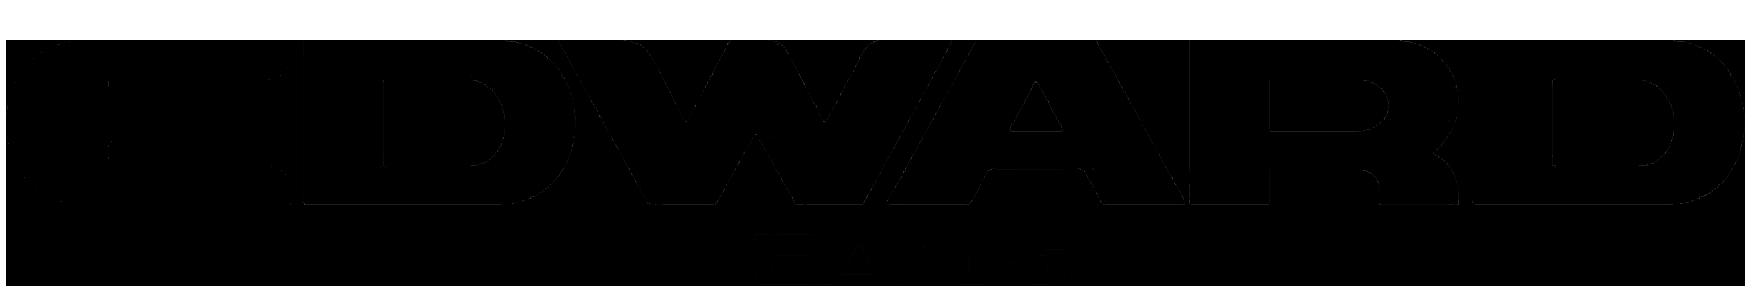 Edward Logo